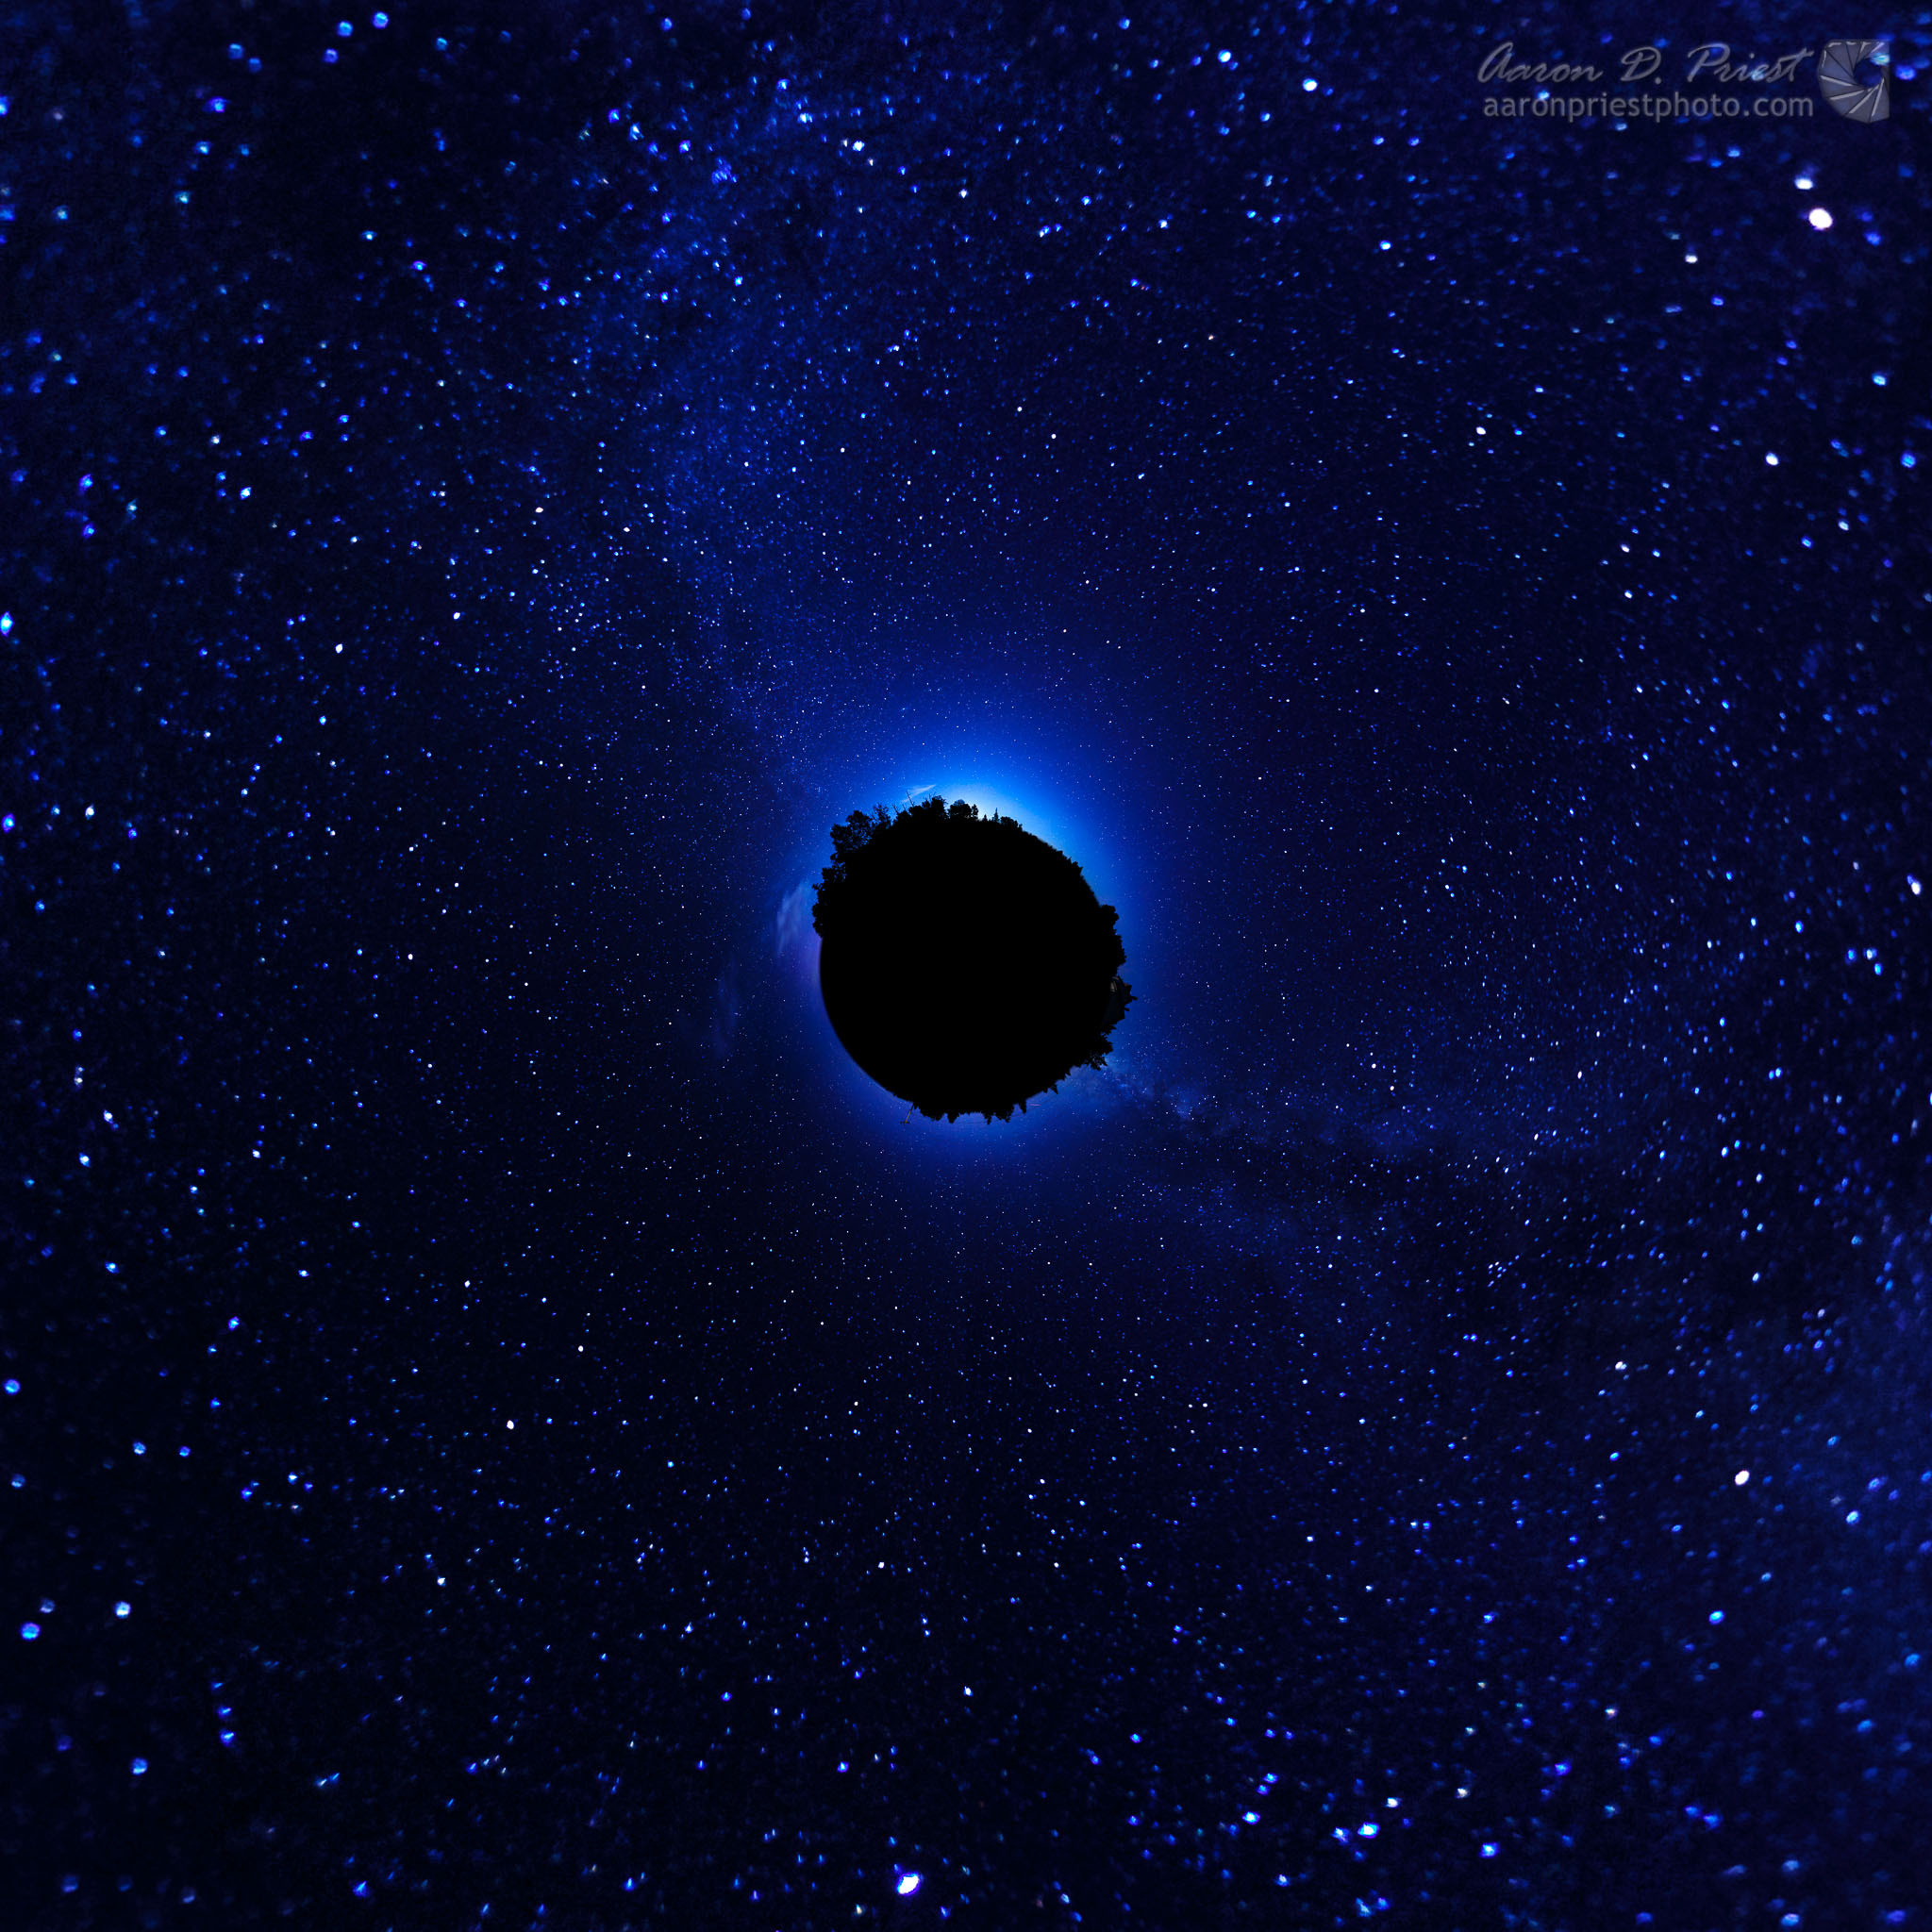 2012-07-12-67900-67916 Little Planet.jpg